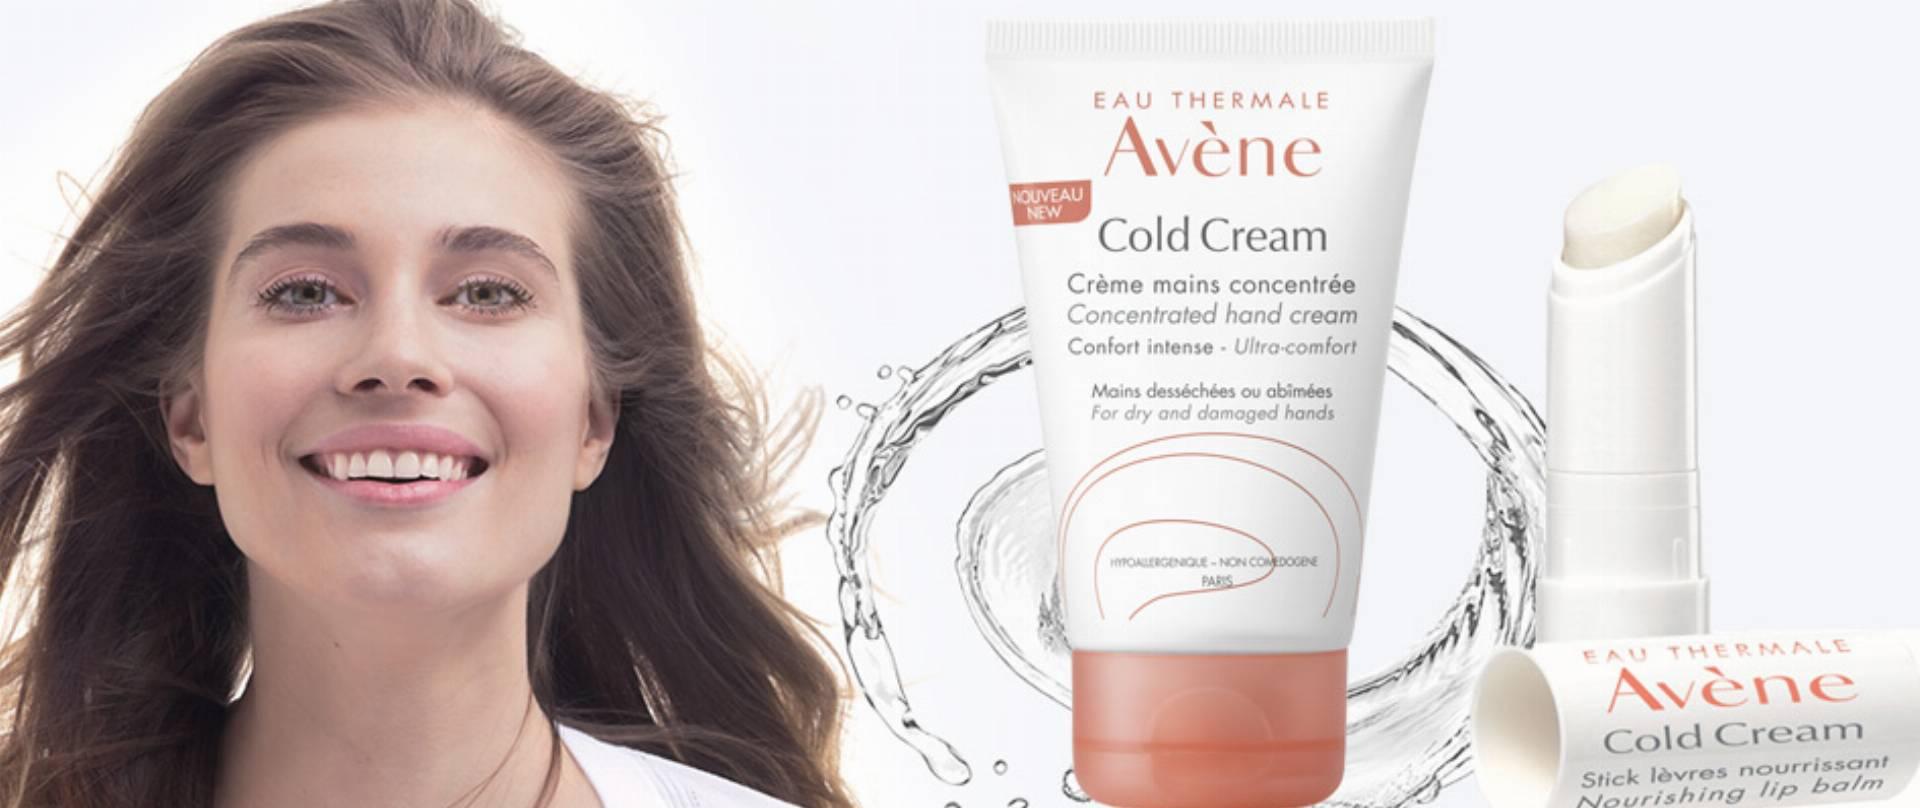 kosmetyki-avene-1